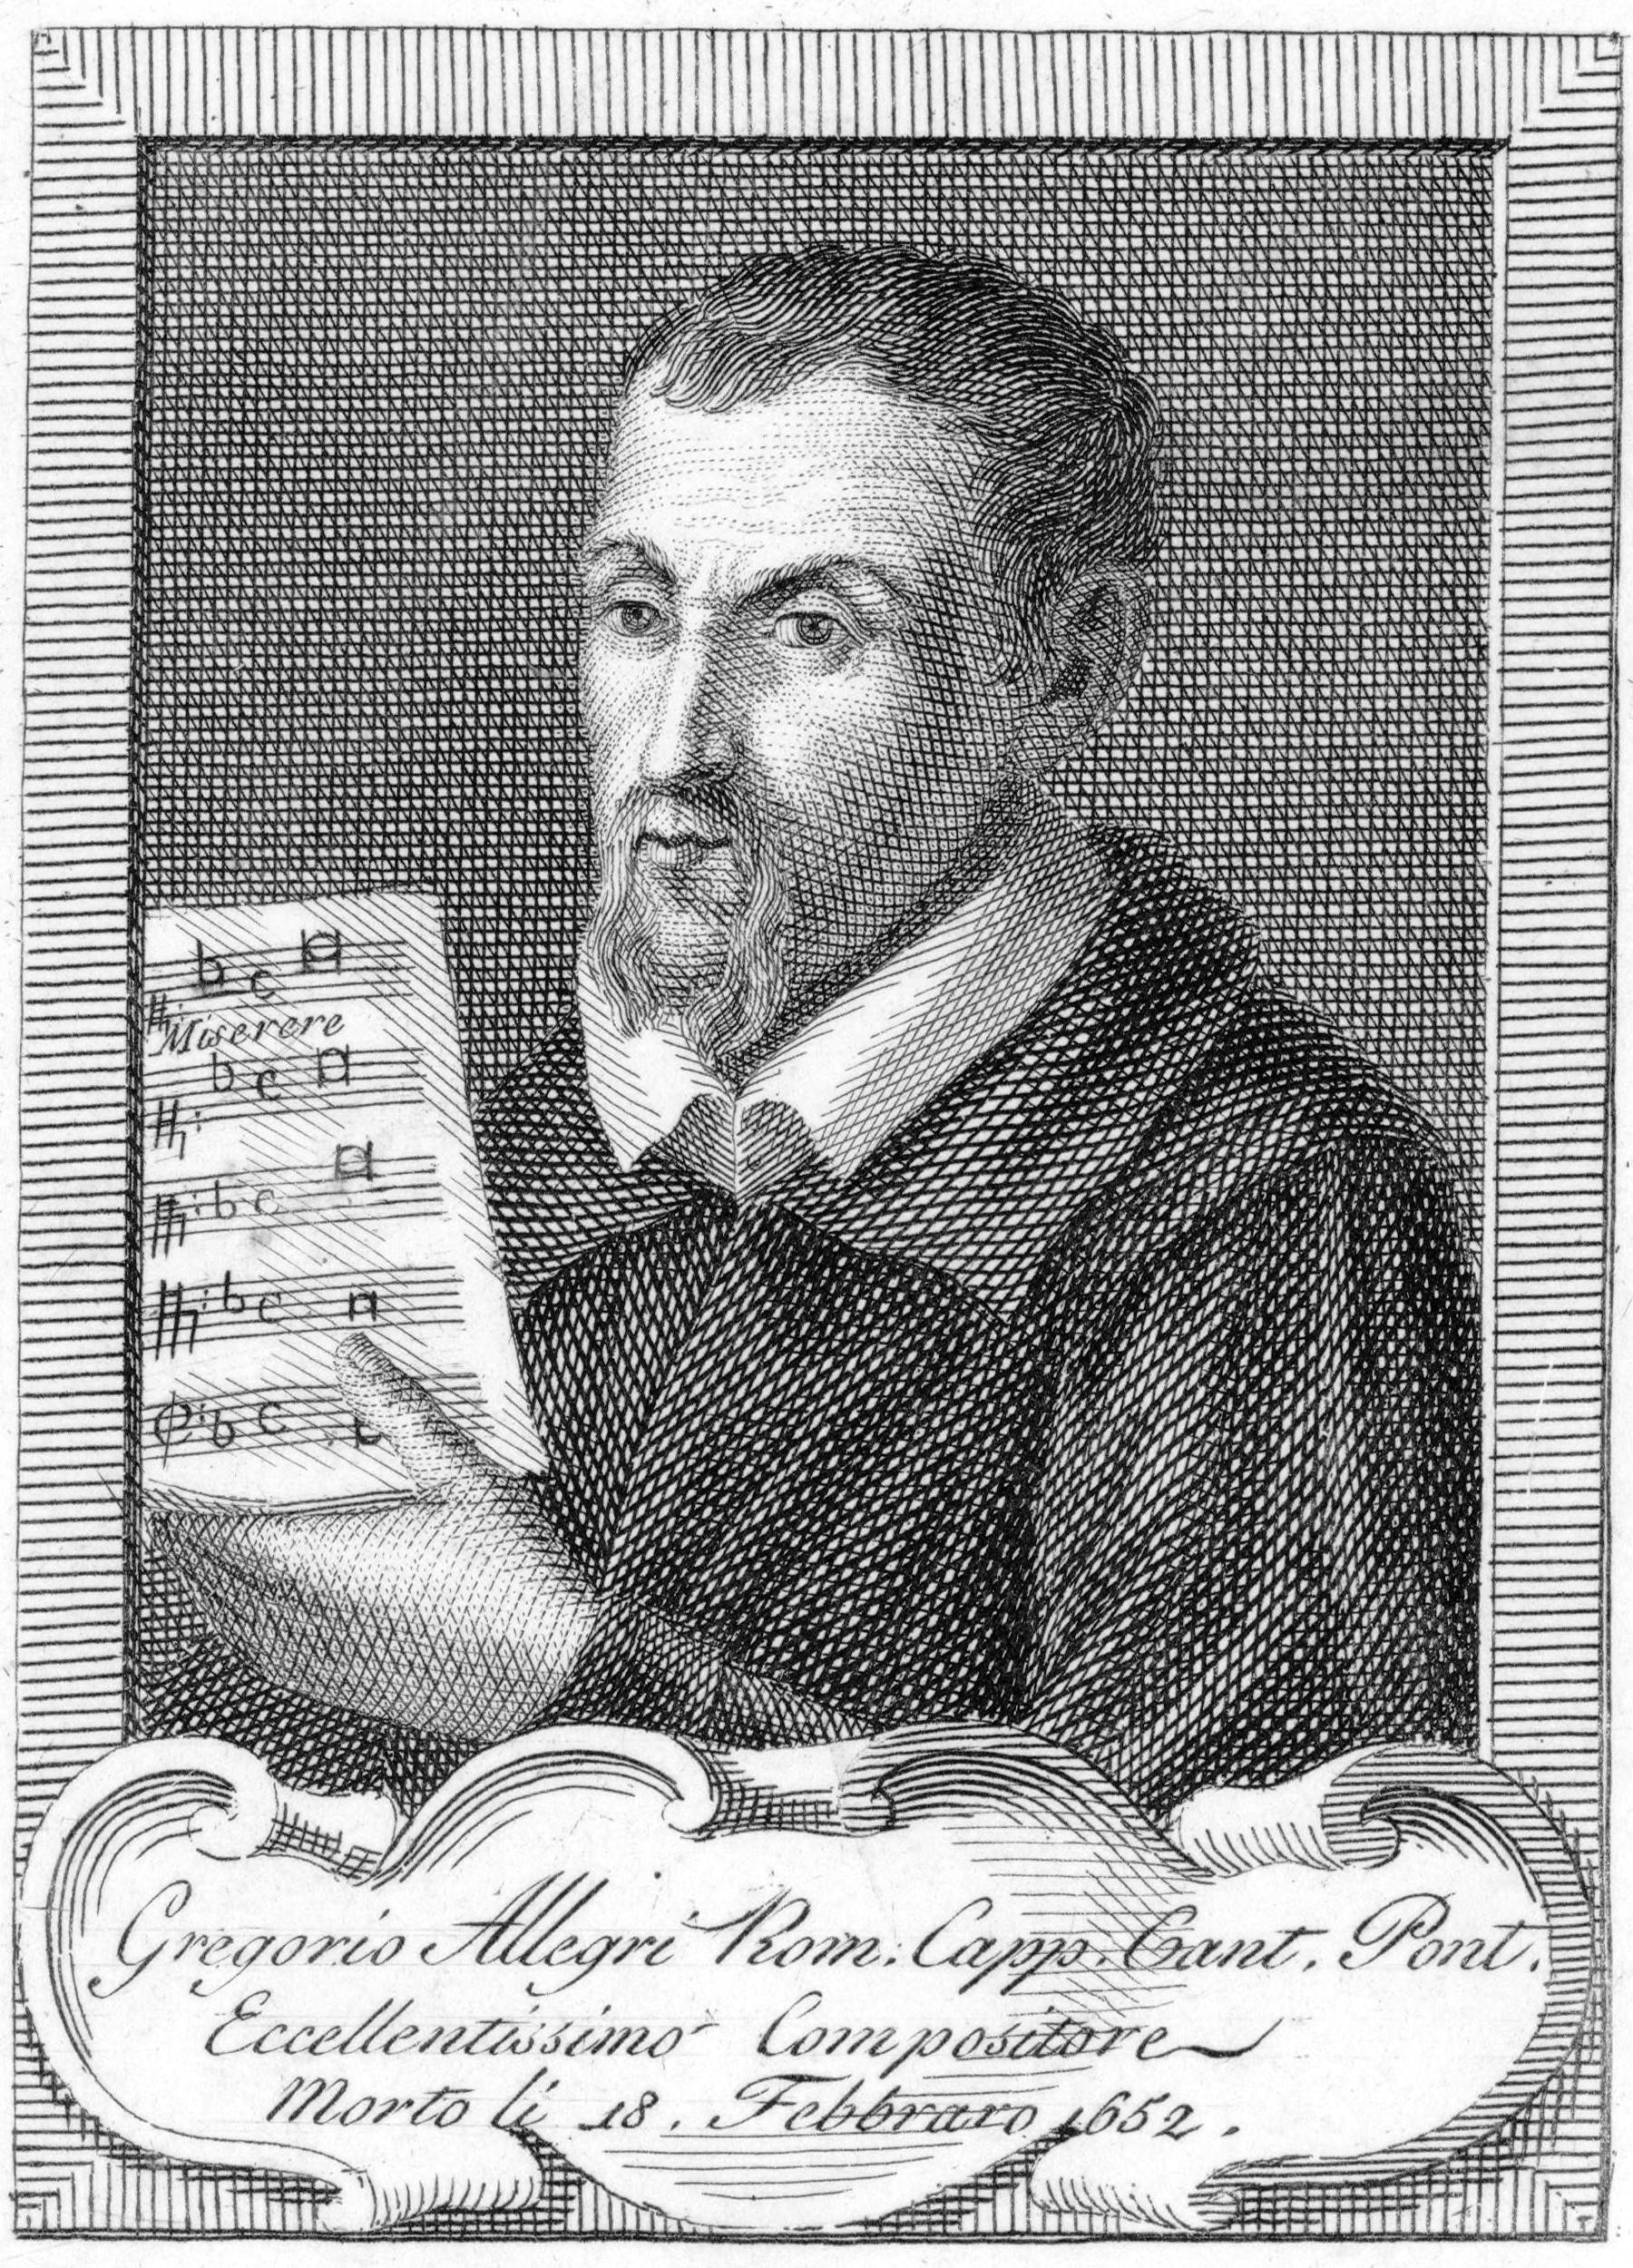 Depiction of Gregorio Allegri